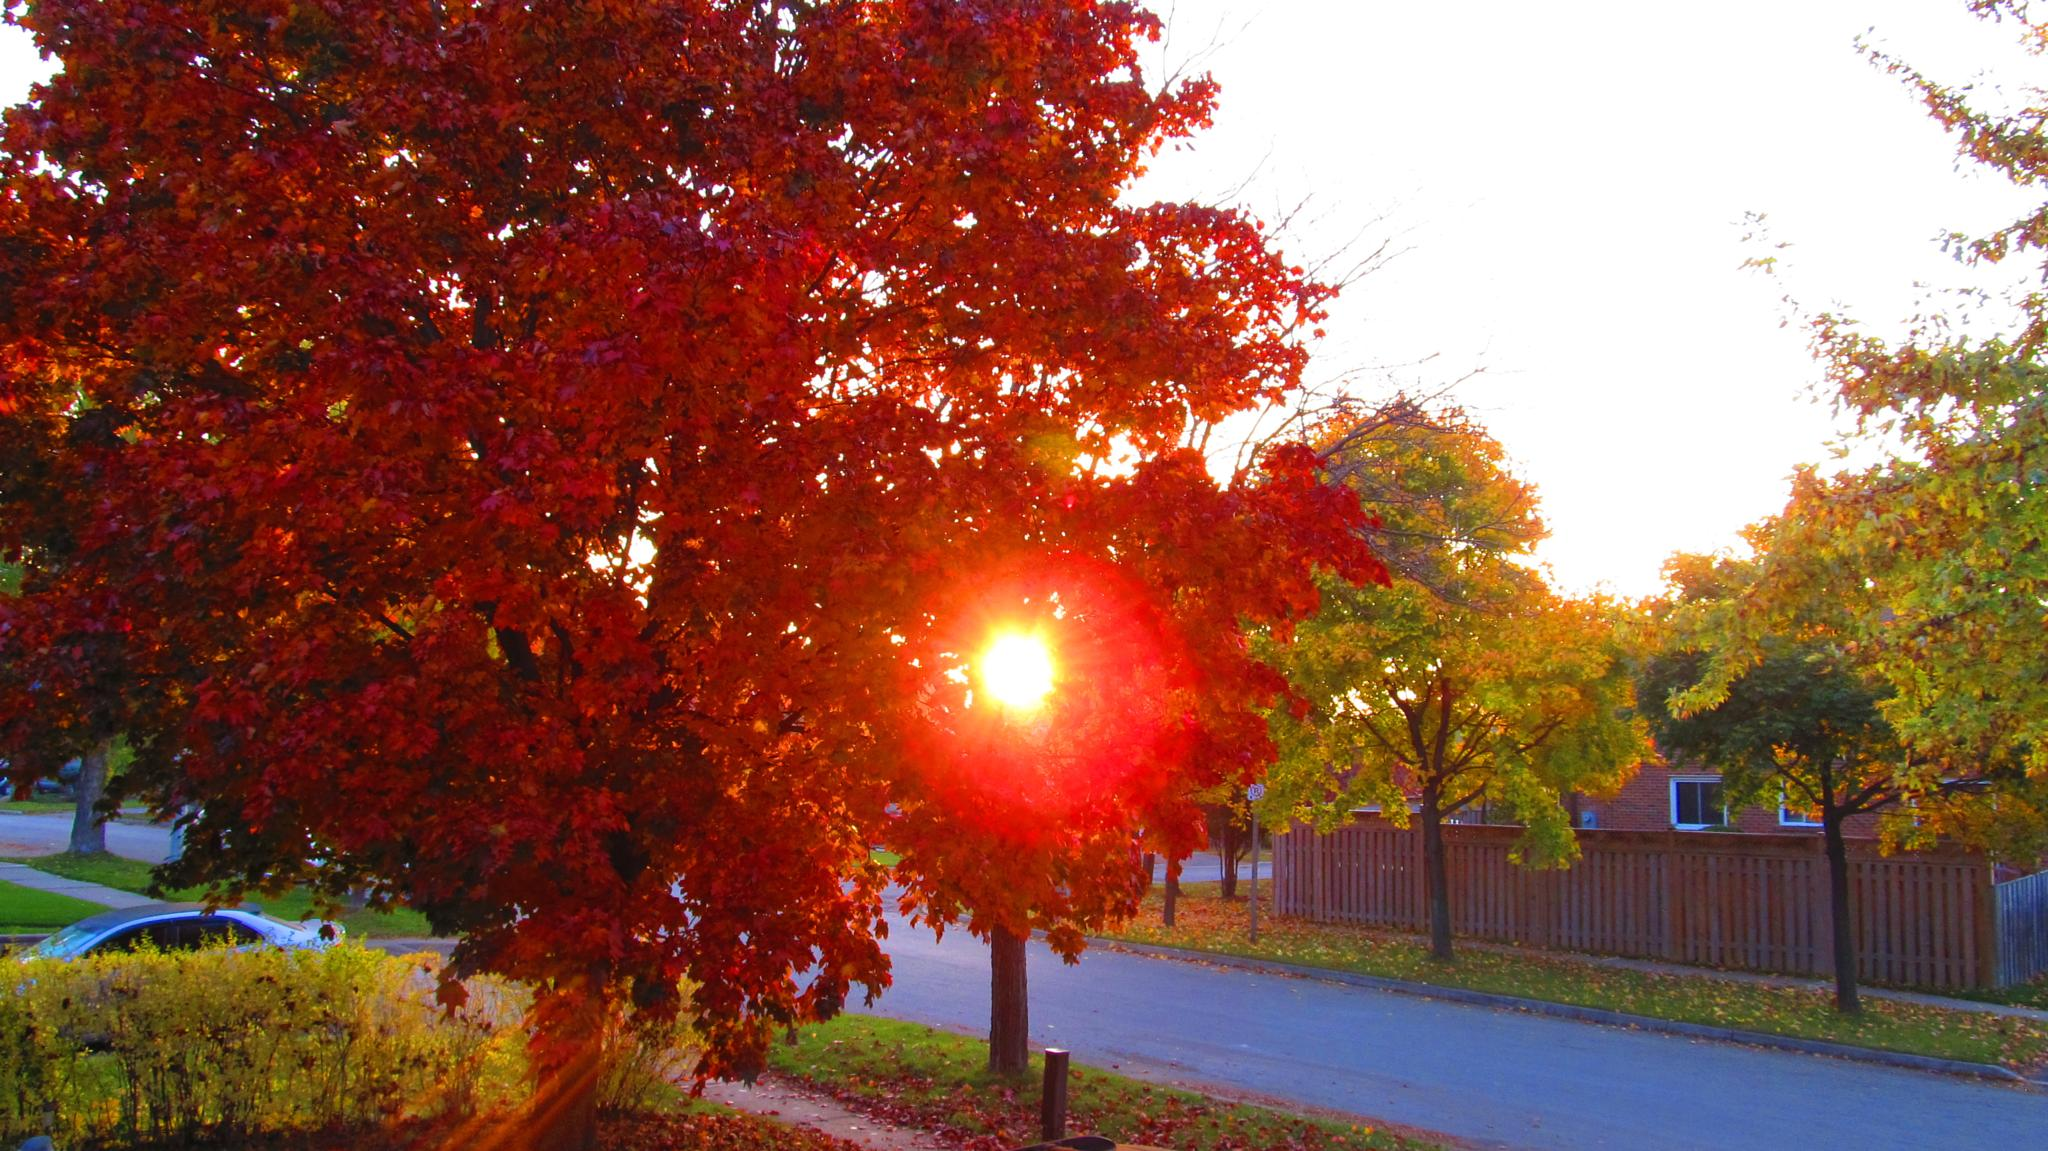 Morning Sunrise by simonp